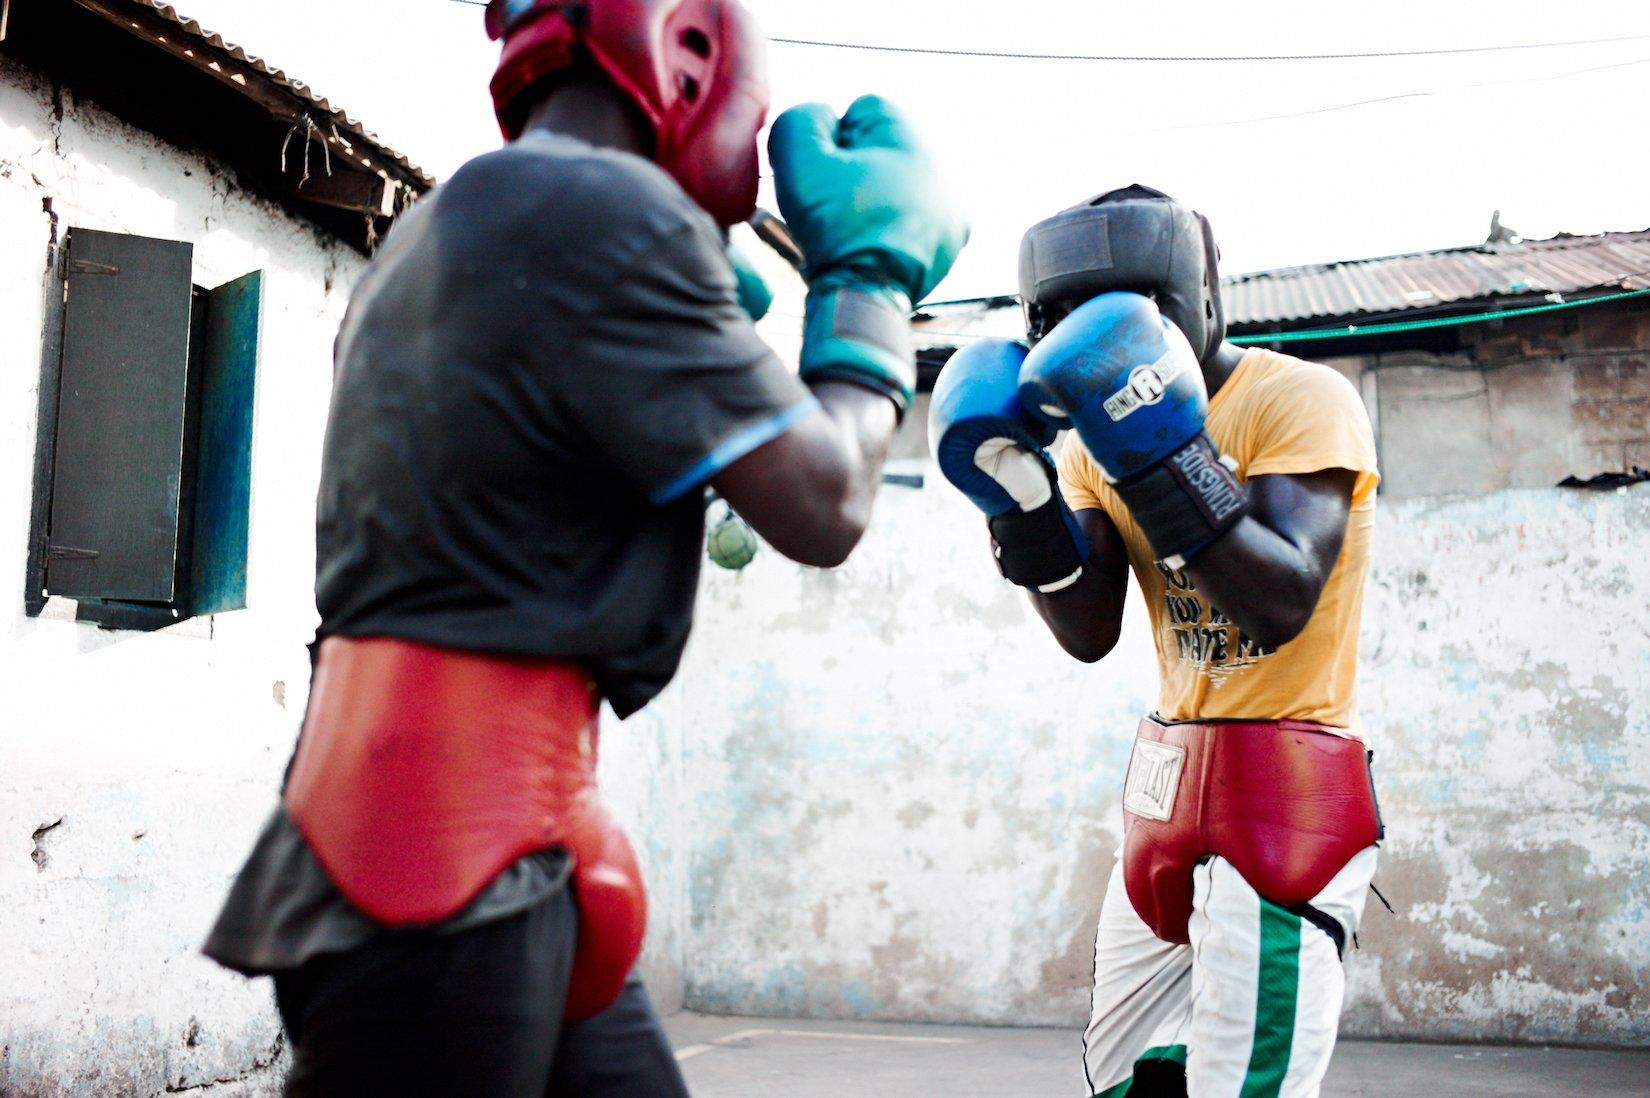 photography_boxersinghana_andreasjakwerth_05